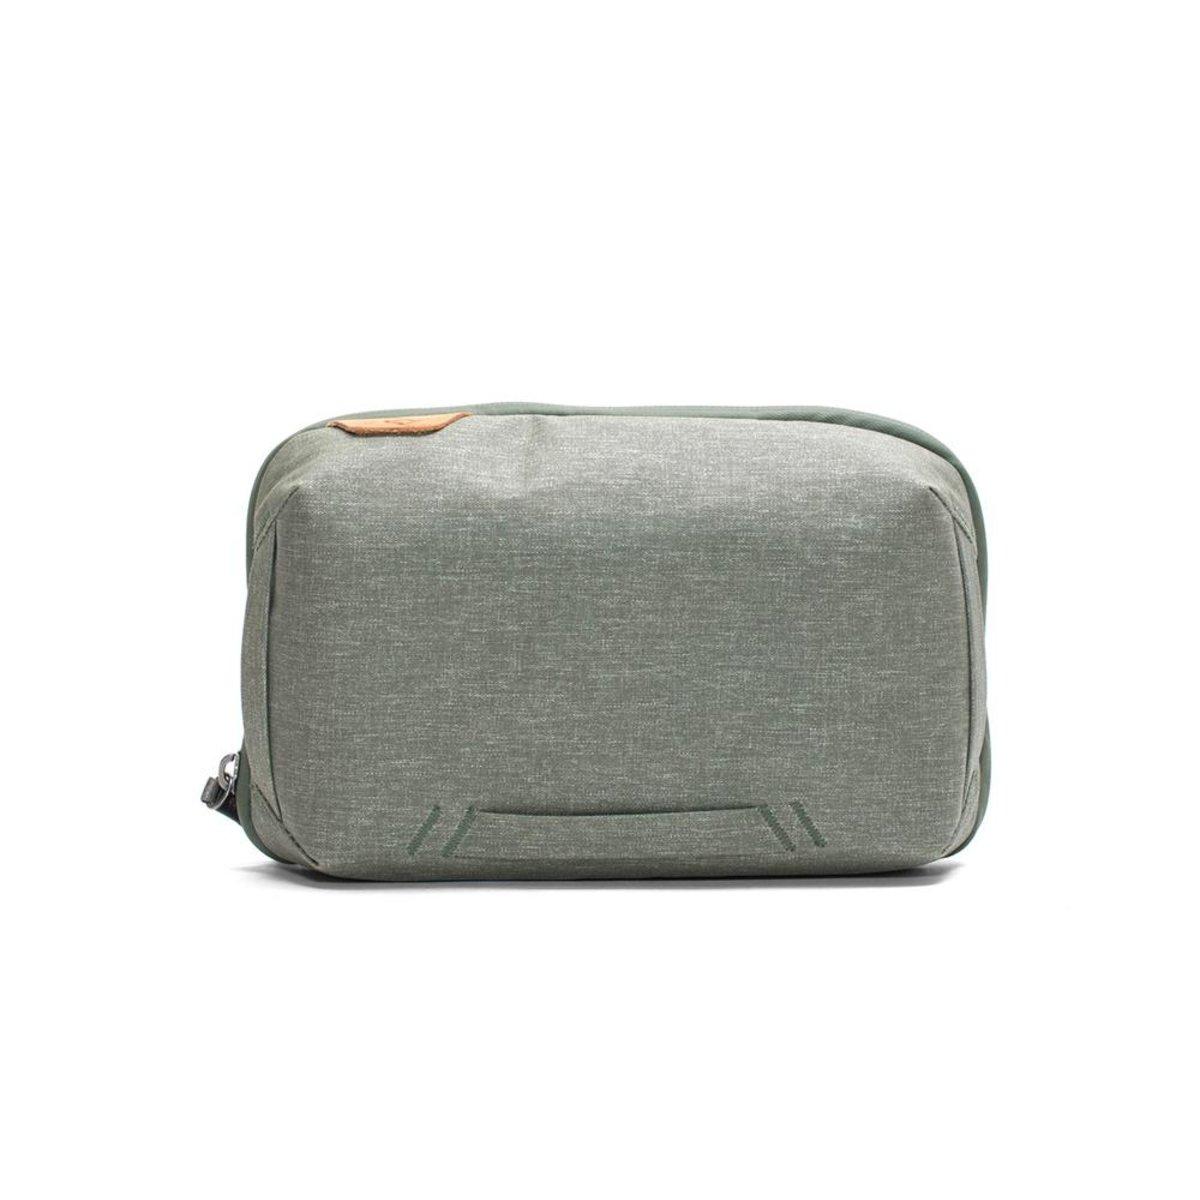 TECH POUCH Bag MultiFunction Storage Bag SAGE